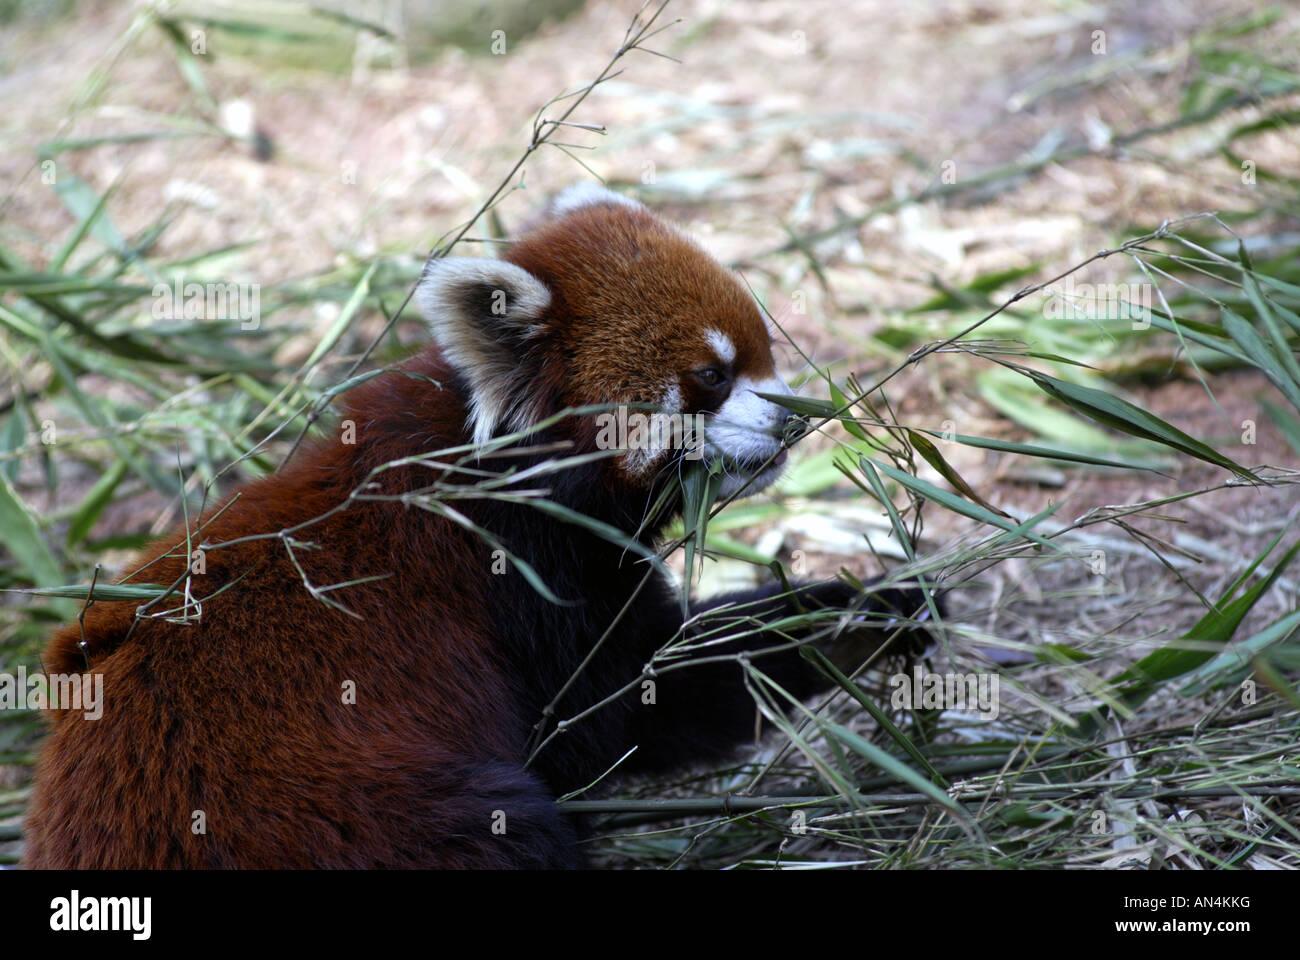 Rote Pandas Essen Bambus Chengdu China Stockfoto Bild 15410643